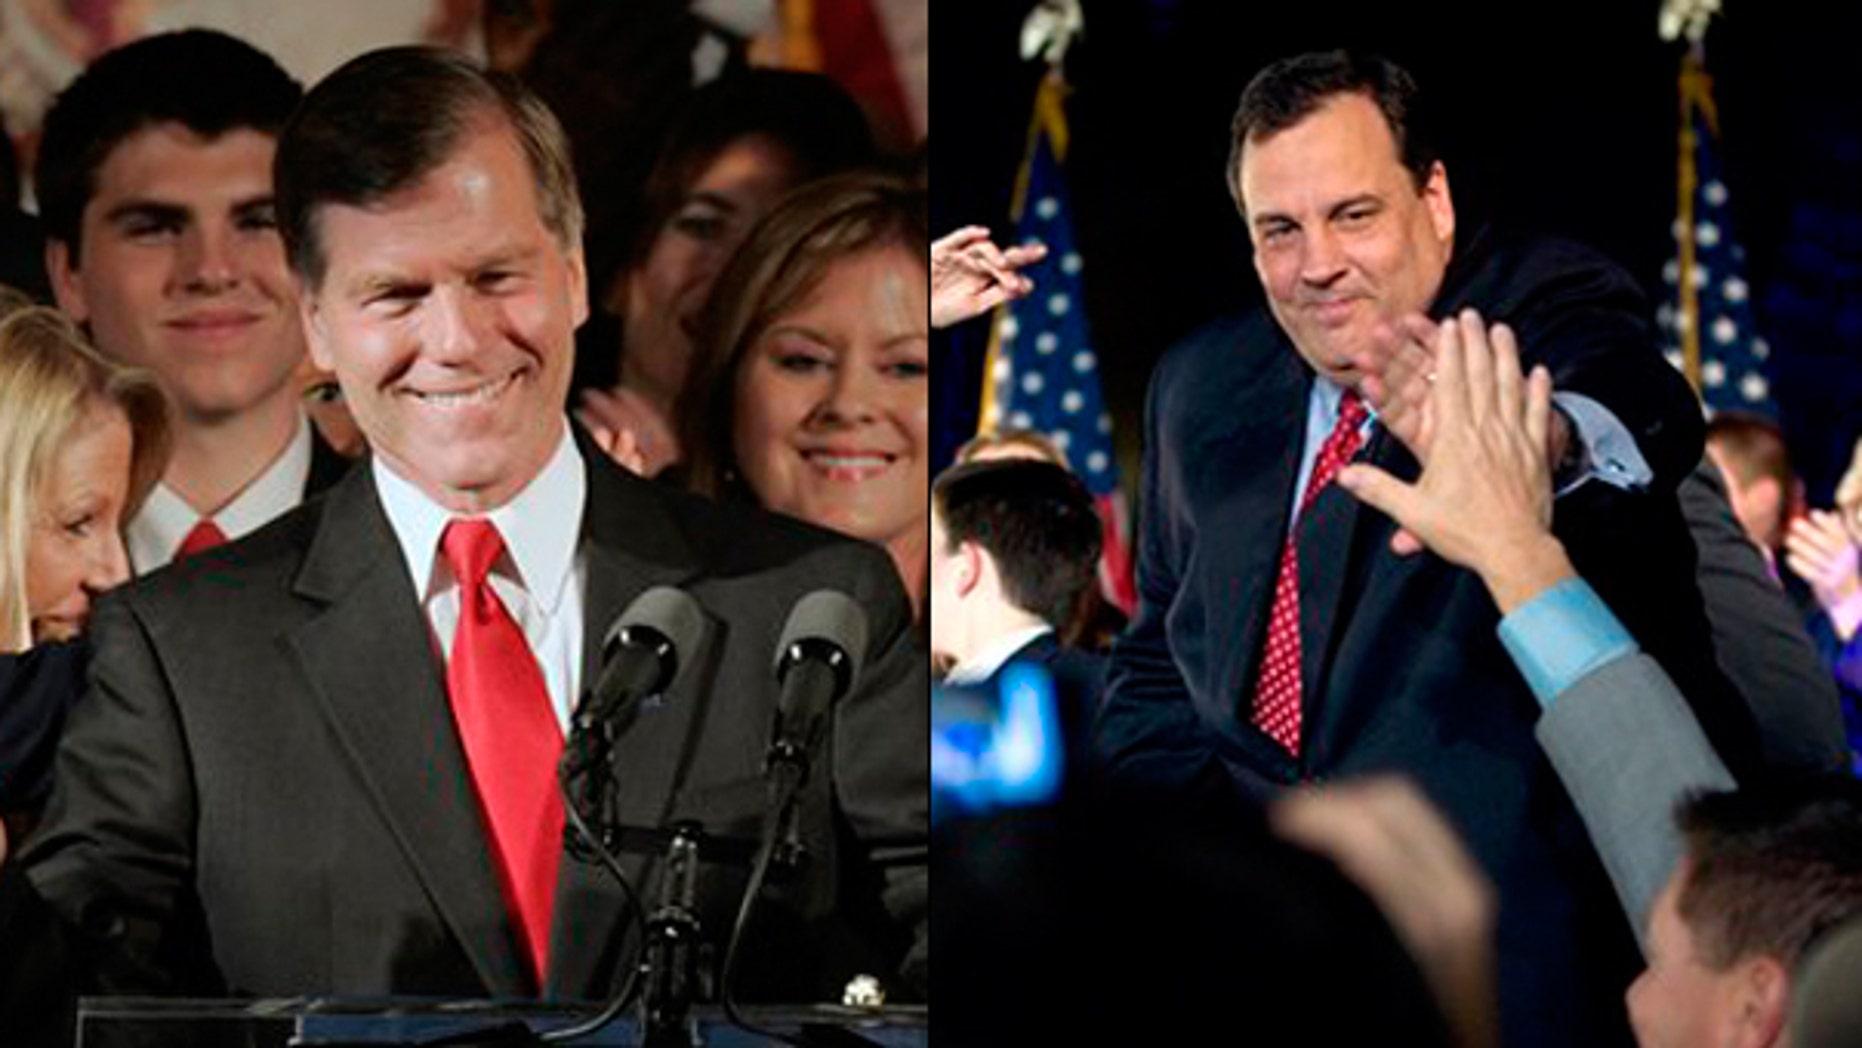 Virginia gubernatorial candidate Bob McDonnell, left, and New Jersey gubernatorial candidate Chris Christie won their respective races Tuesday. (AP Photos)